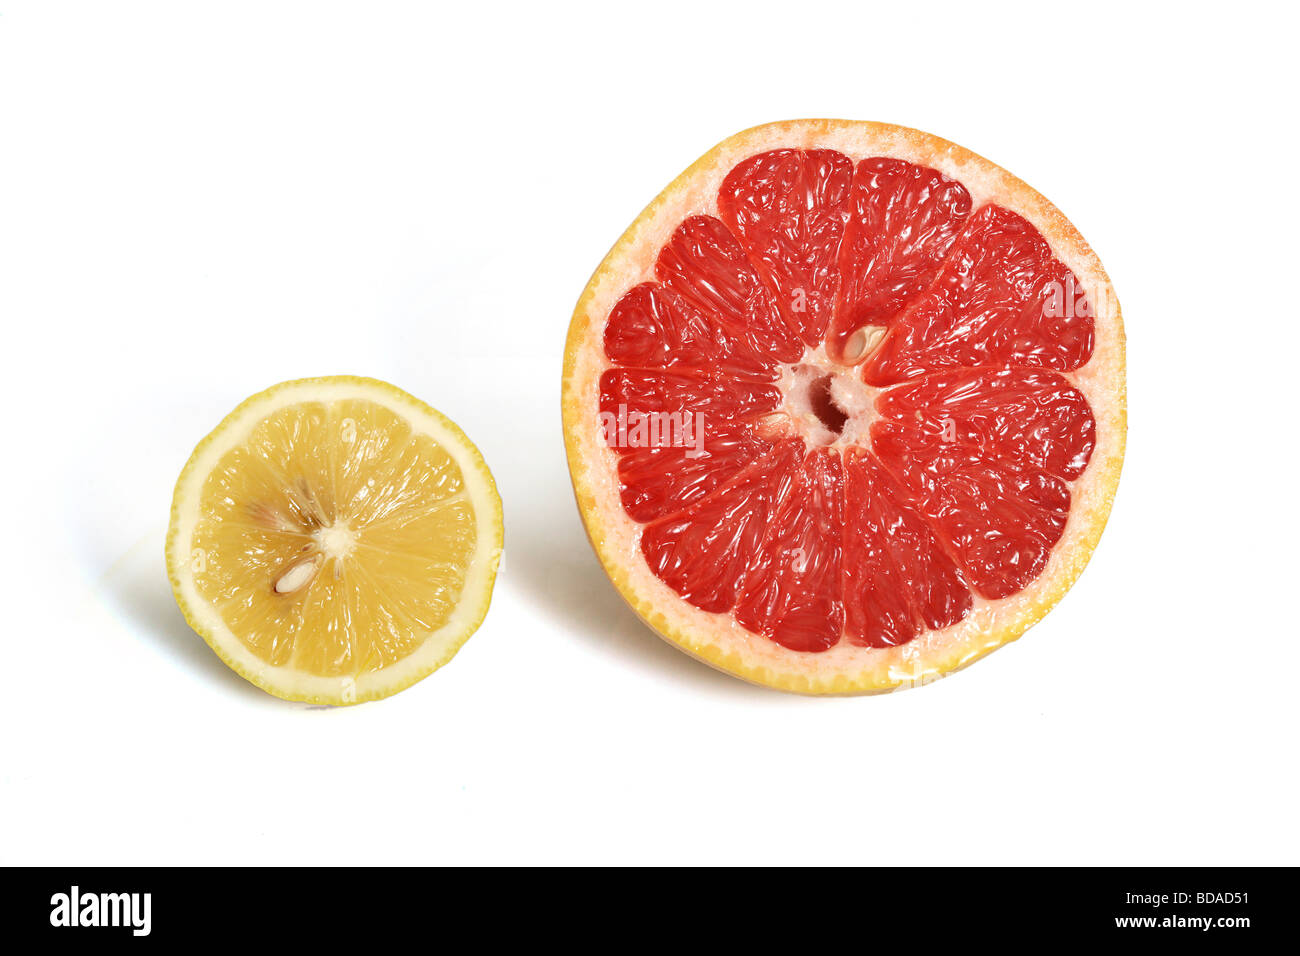 Fruit,Still life - Stock Image